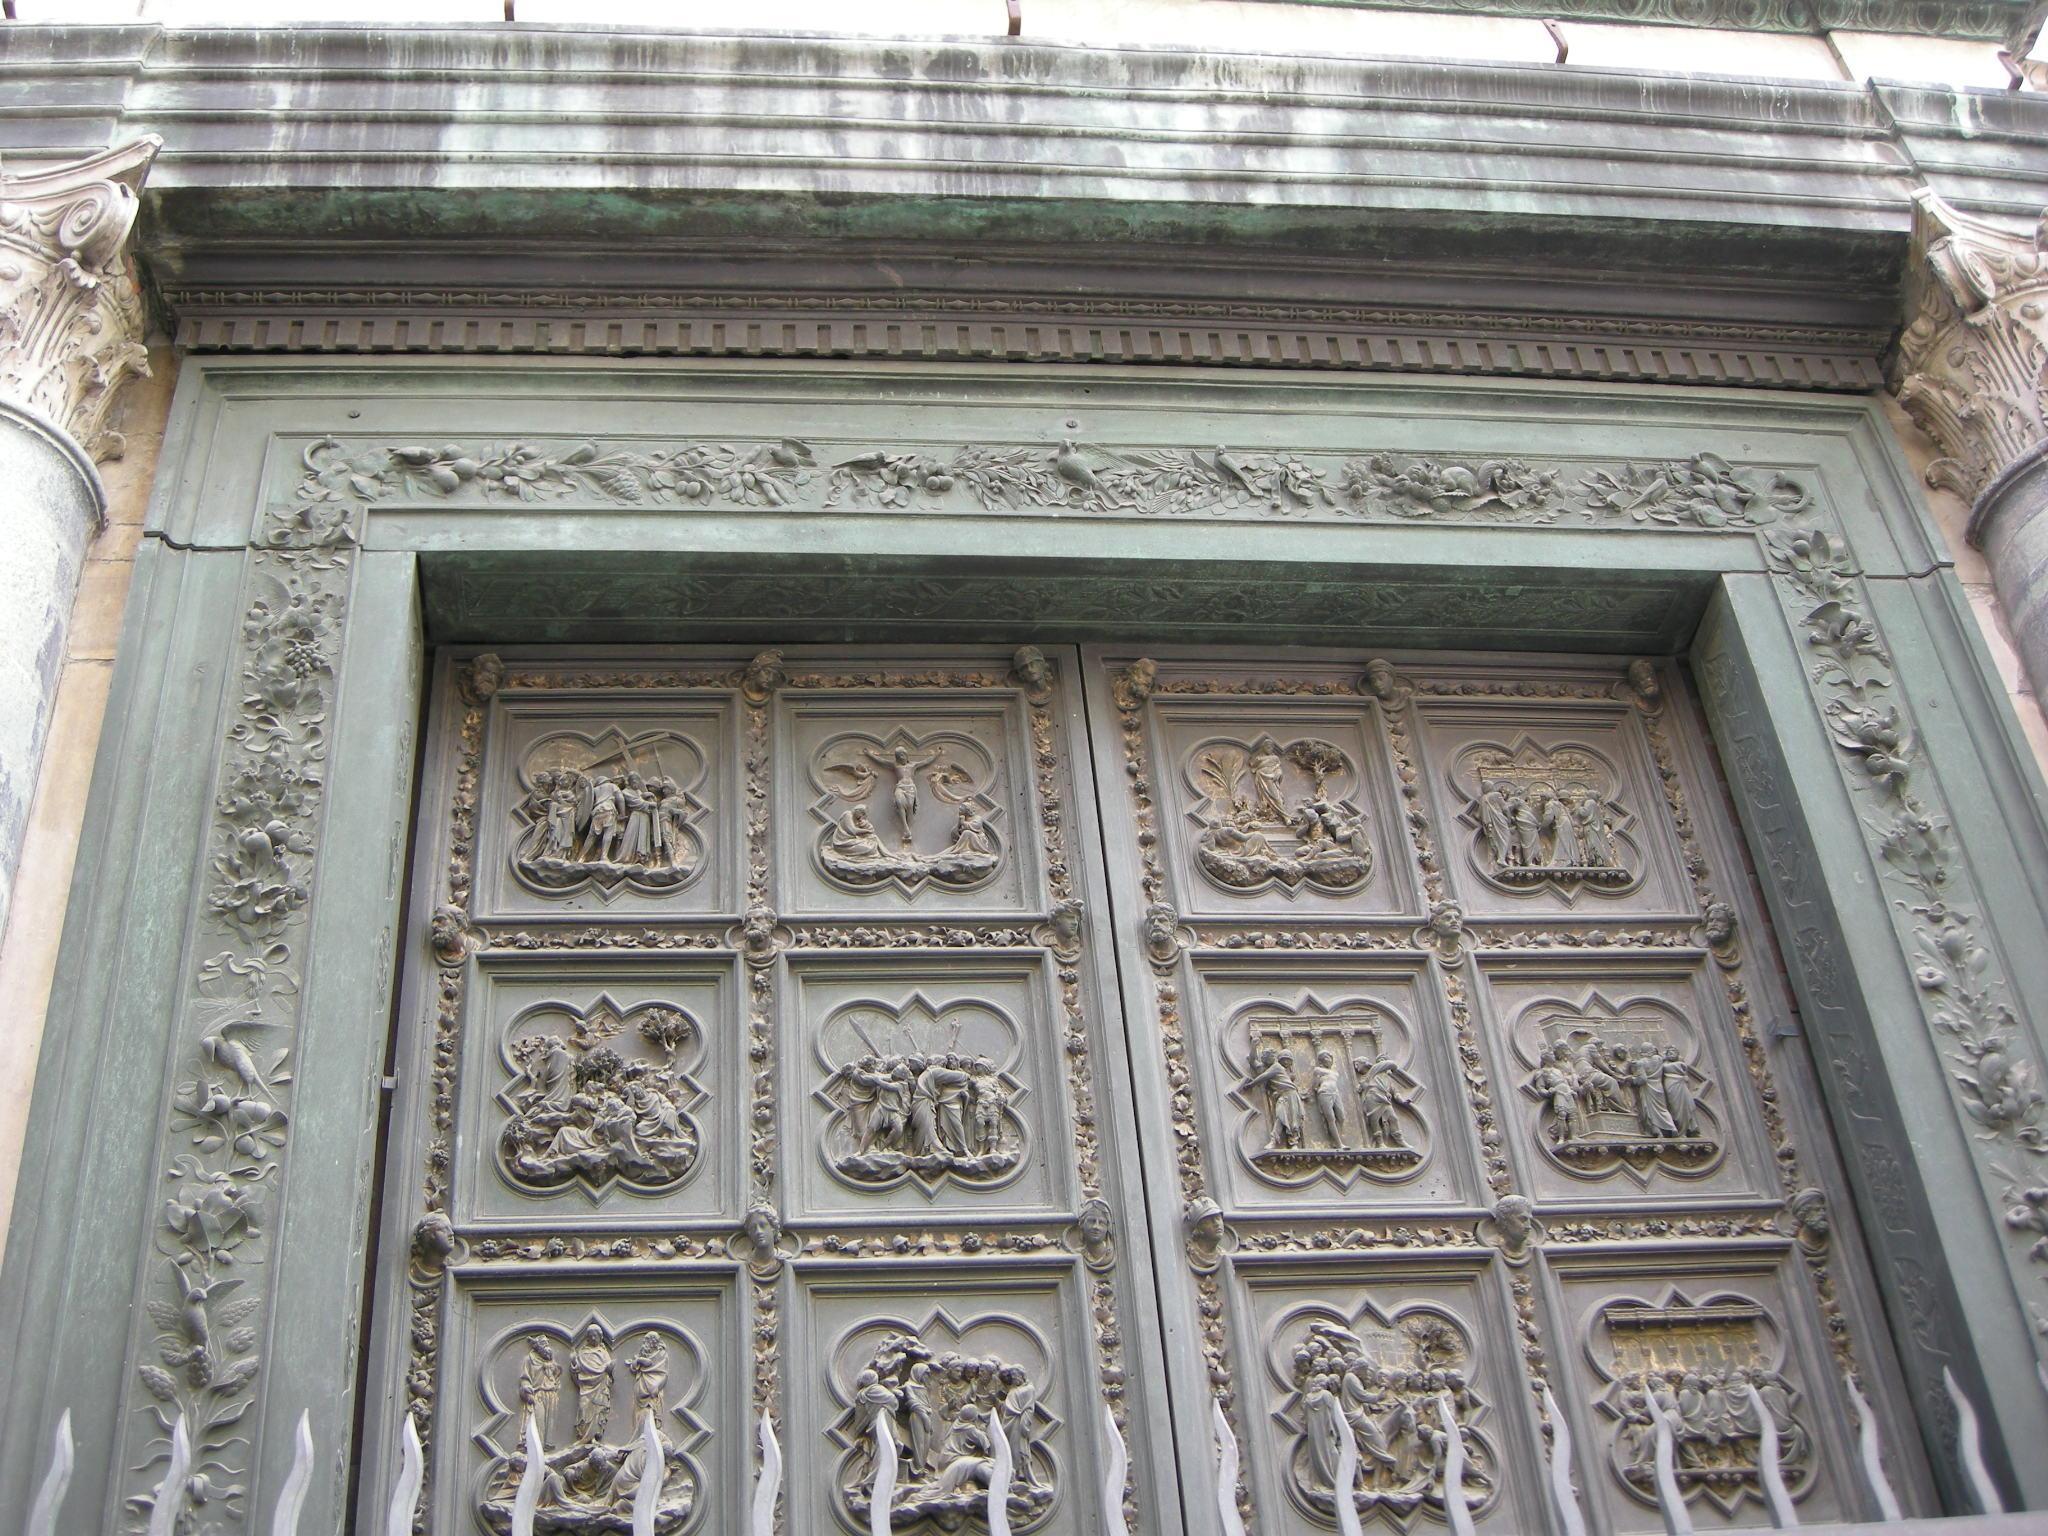 FileNorth Doors of the Florence Baptistry upper.JPG & File:North Doors of the Florence Baptistry upper.JPG - Wikimedia ...